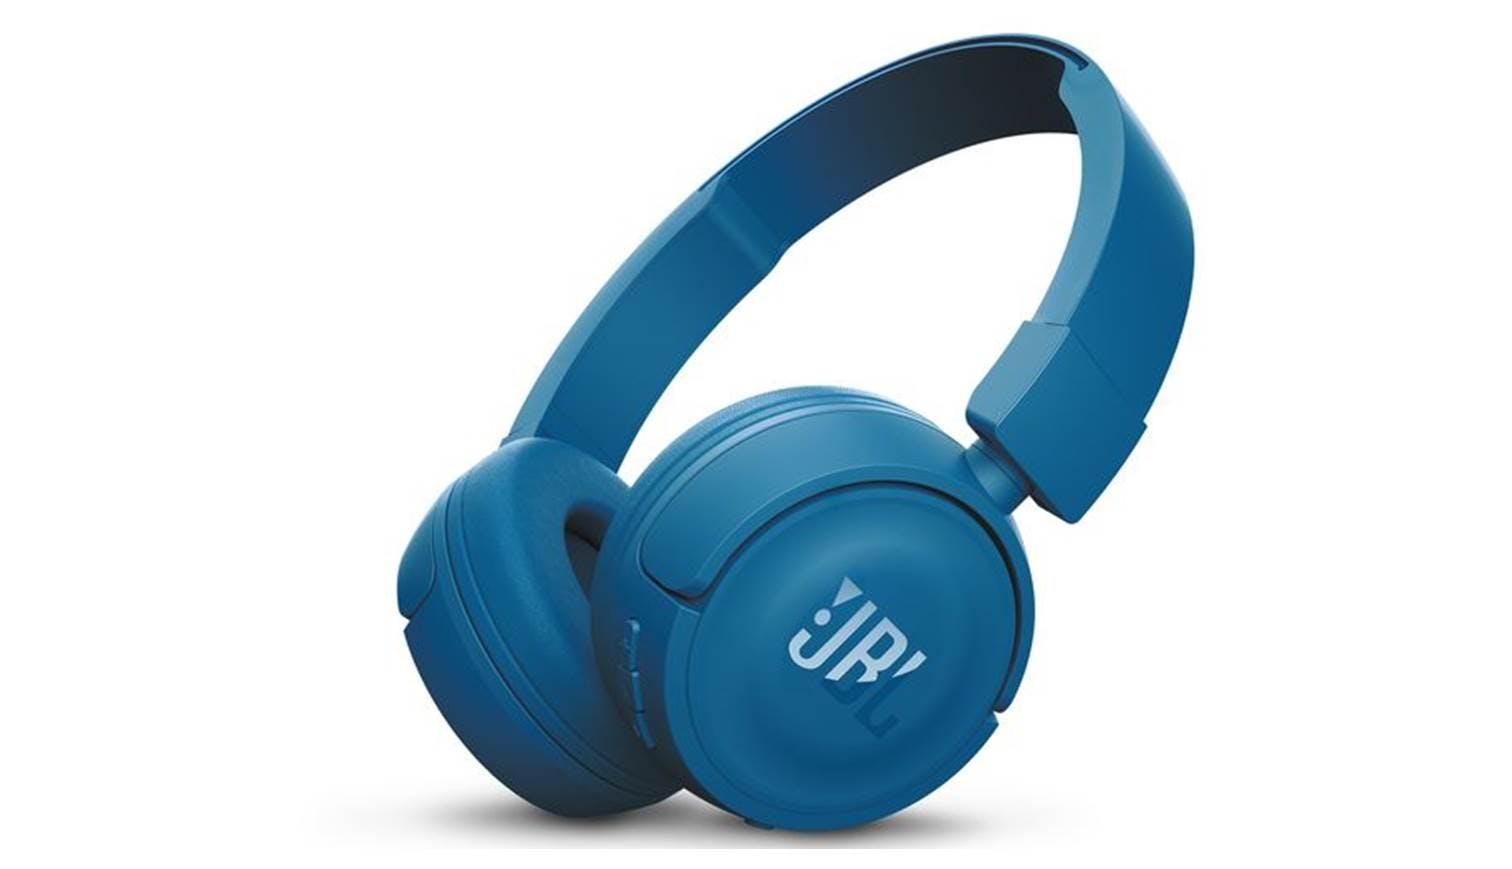 53180b760b4 JBL T450 Bluetooth On-Ear Headphones - Blue | Harvey Norman Singapore